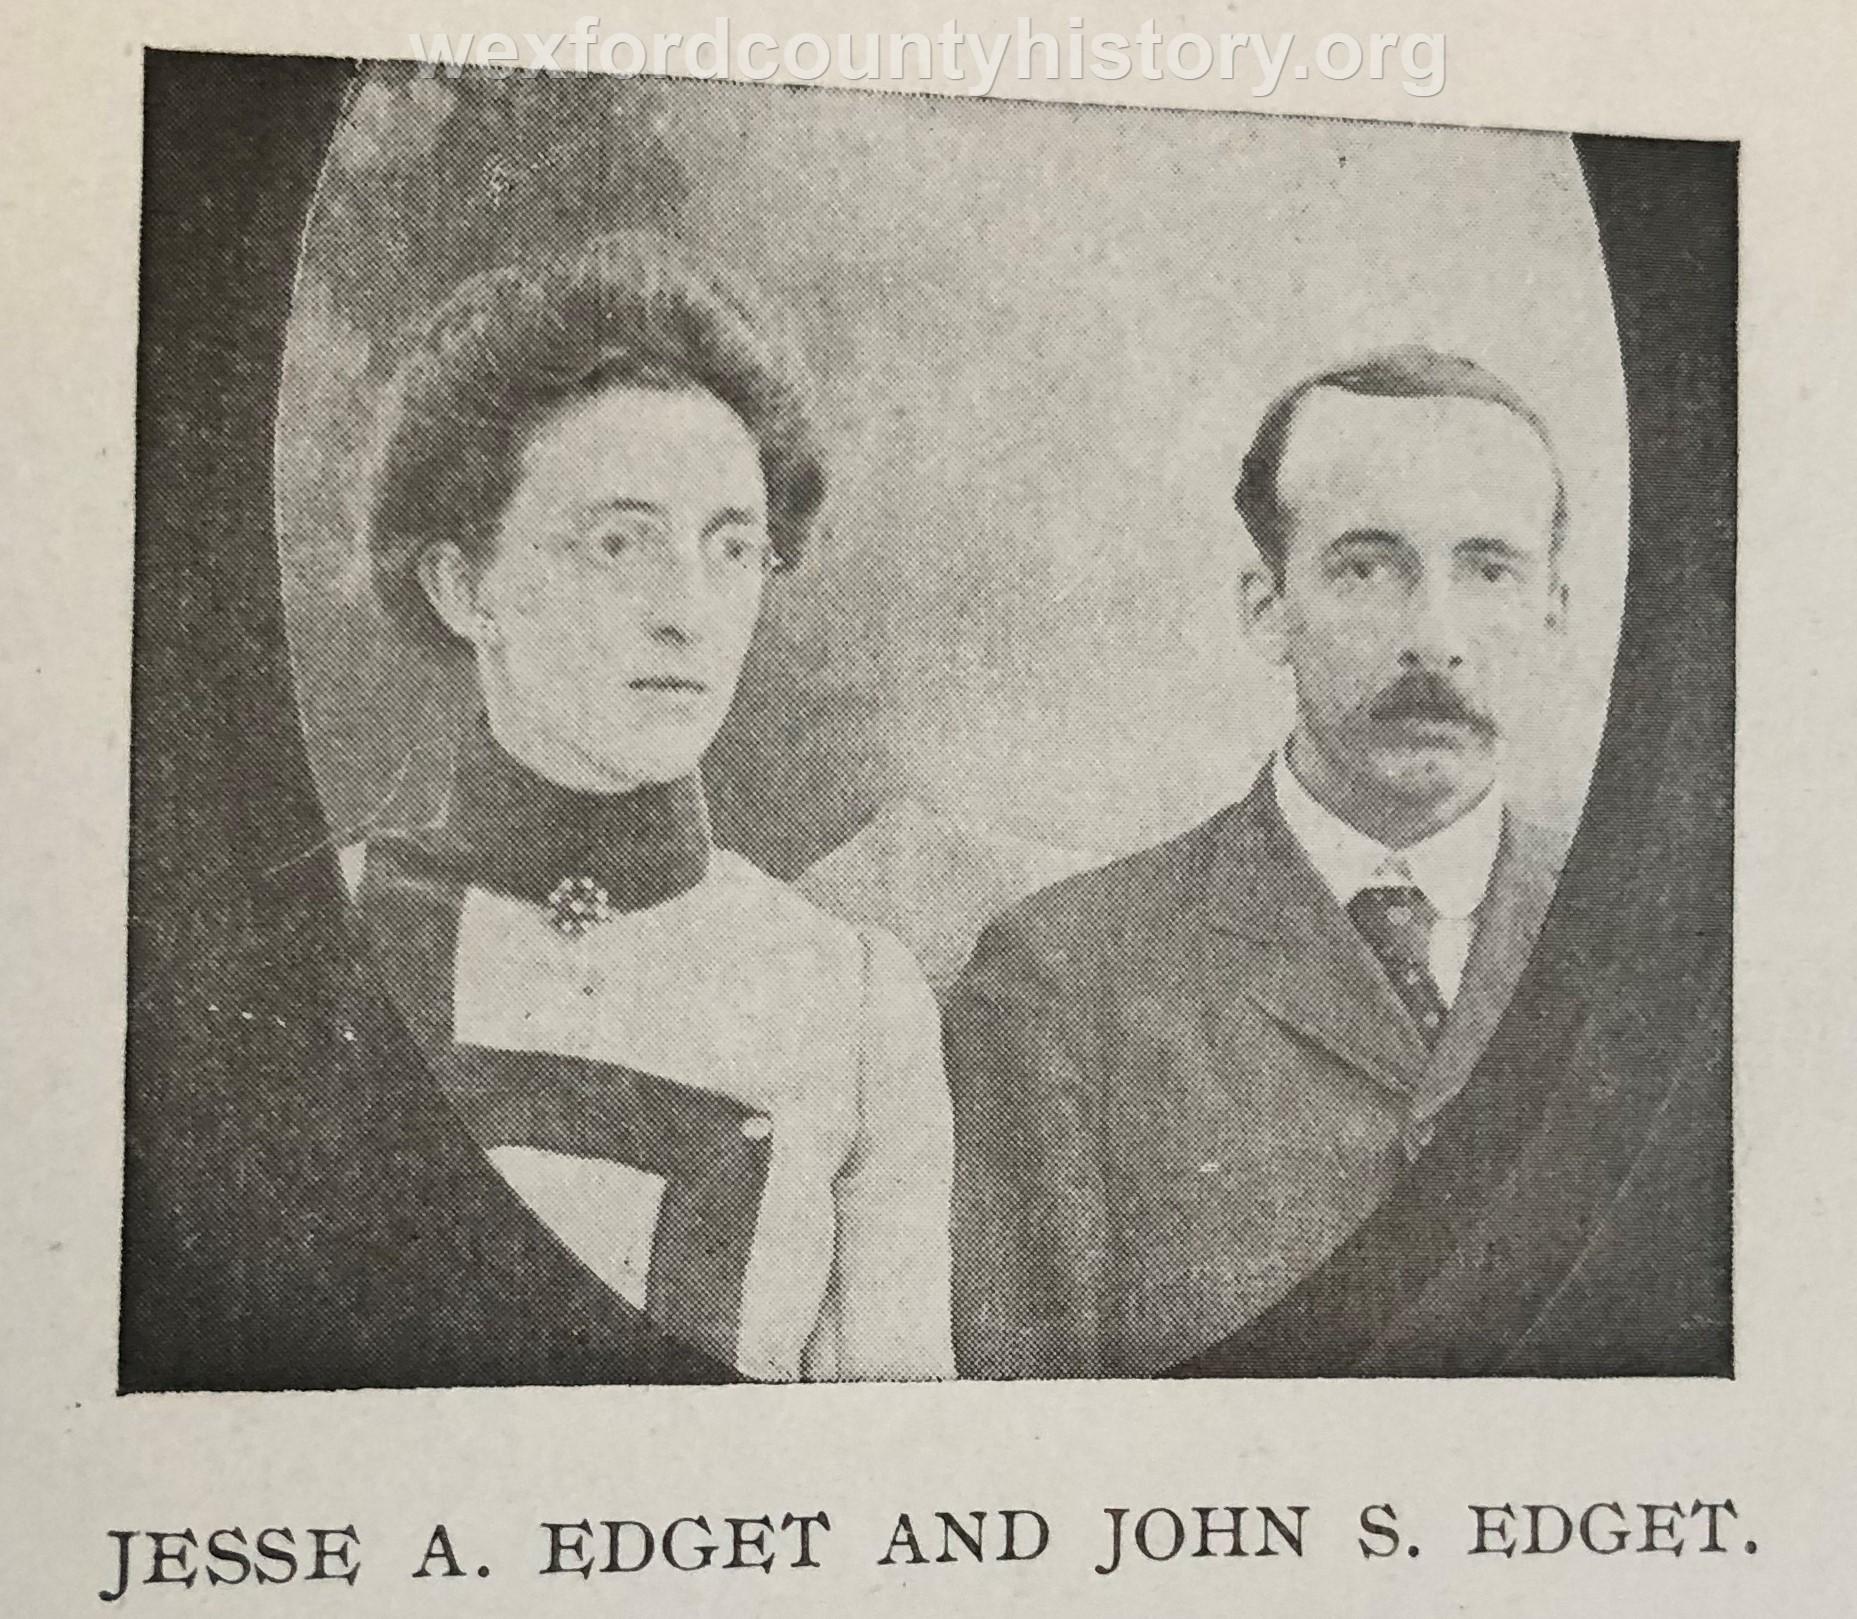 John and Jesse Edget